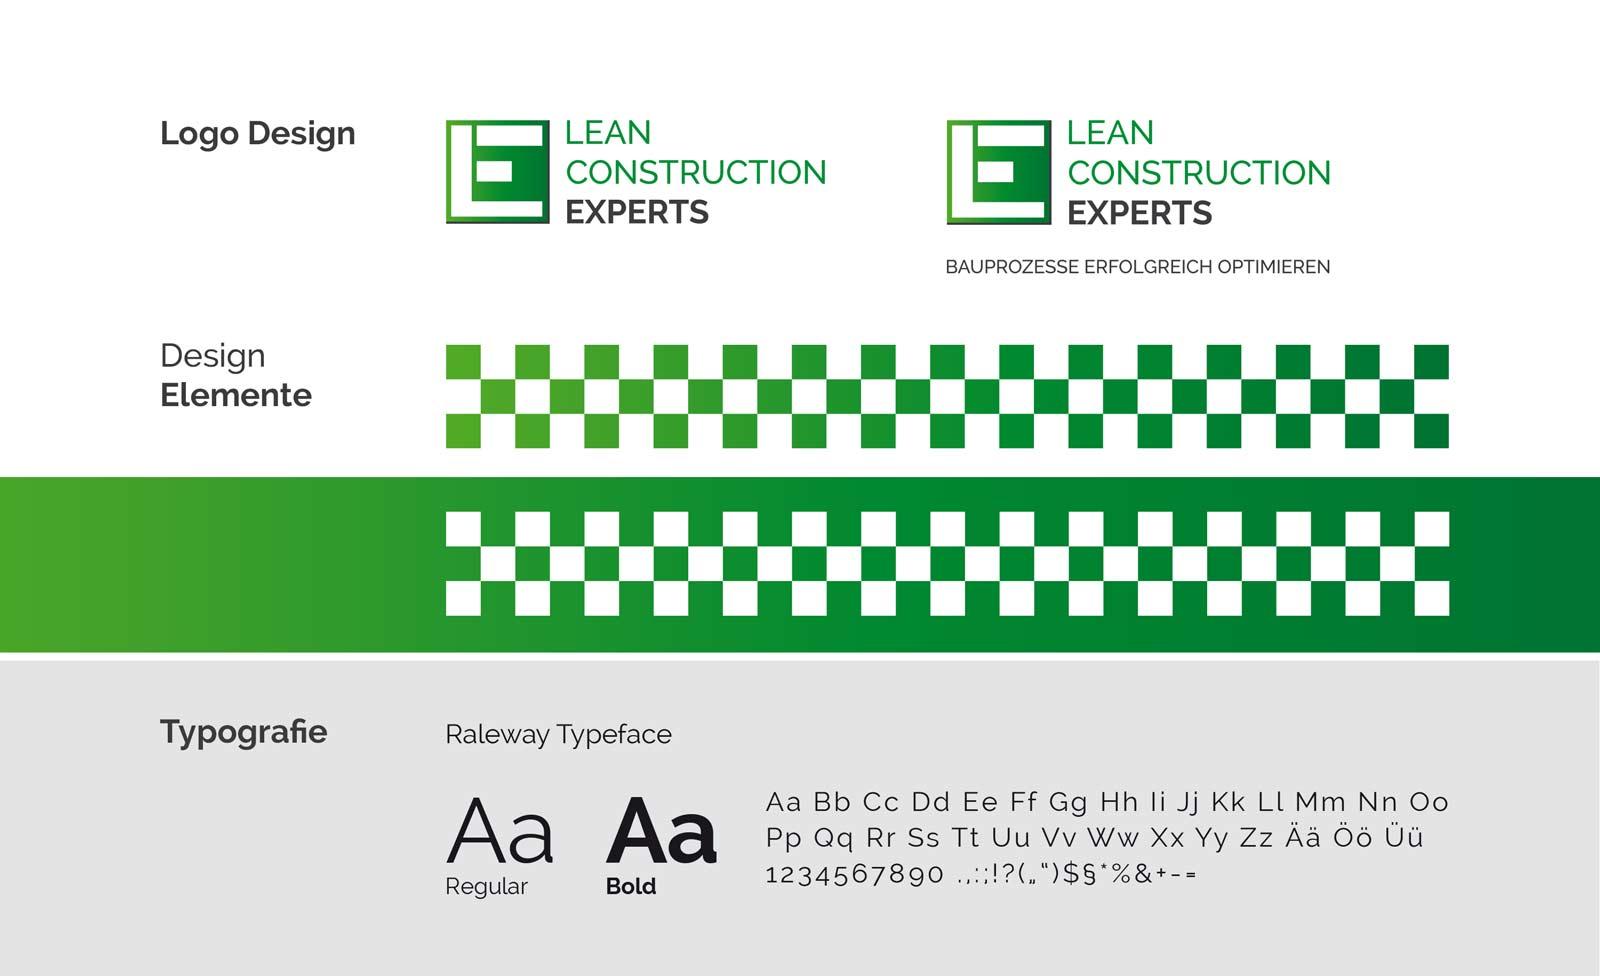 Lean_Construction_Experts_Corporate_Design_Logo_Design_2.jpg